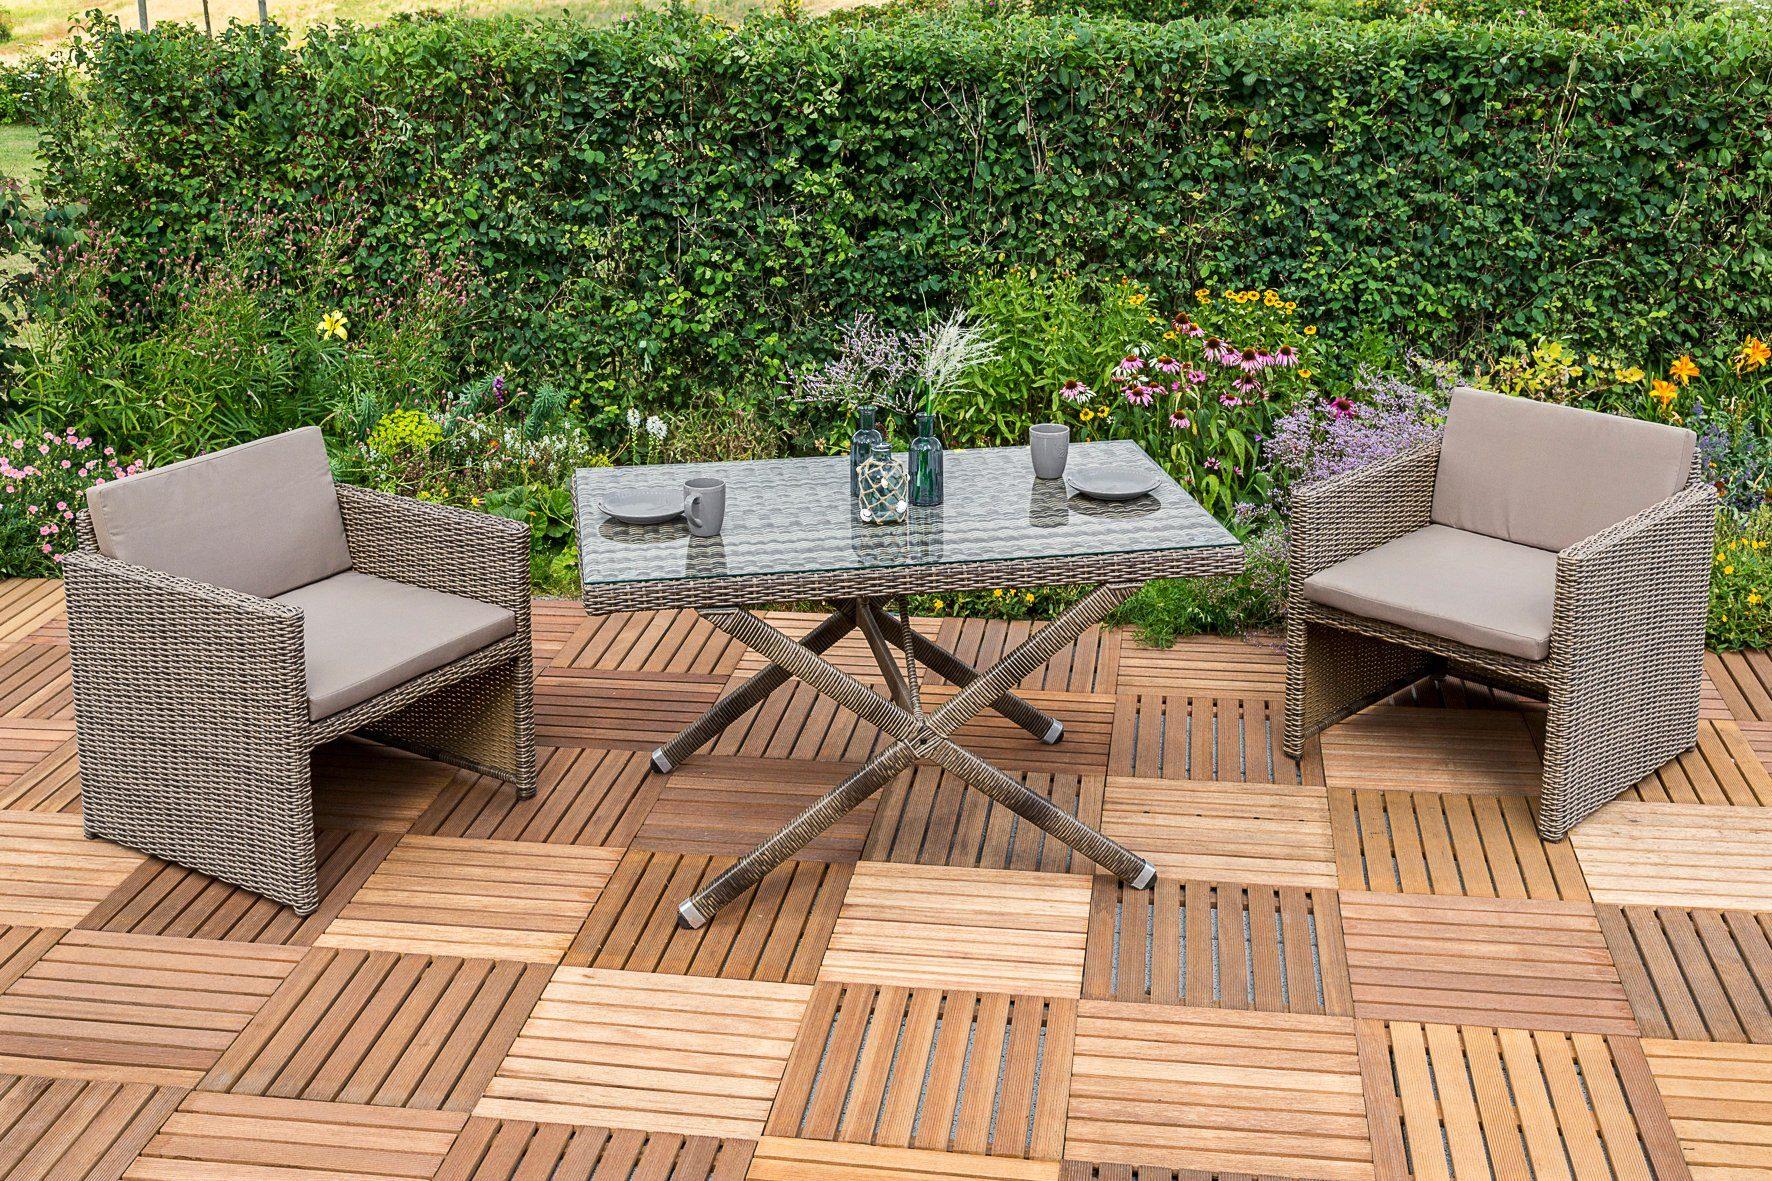 MERXX Gartenmöbelset »Avola«, 7-tlg., 2 Sessel, Tisch 130x80 cm, Polyrattan, natur